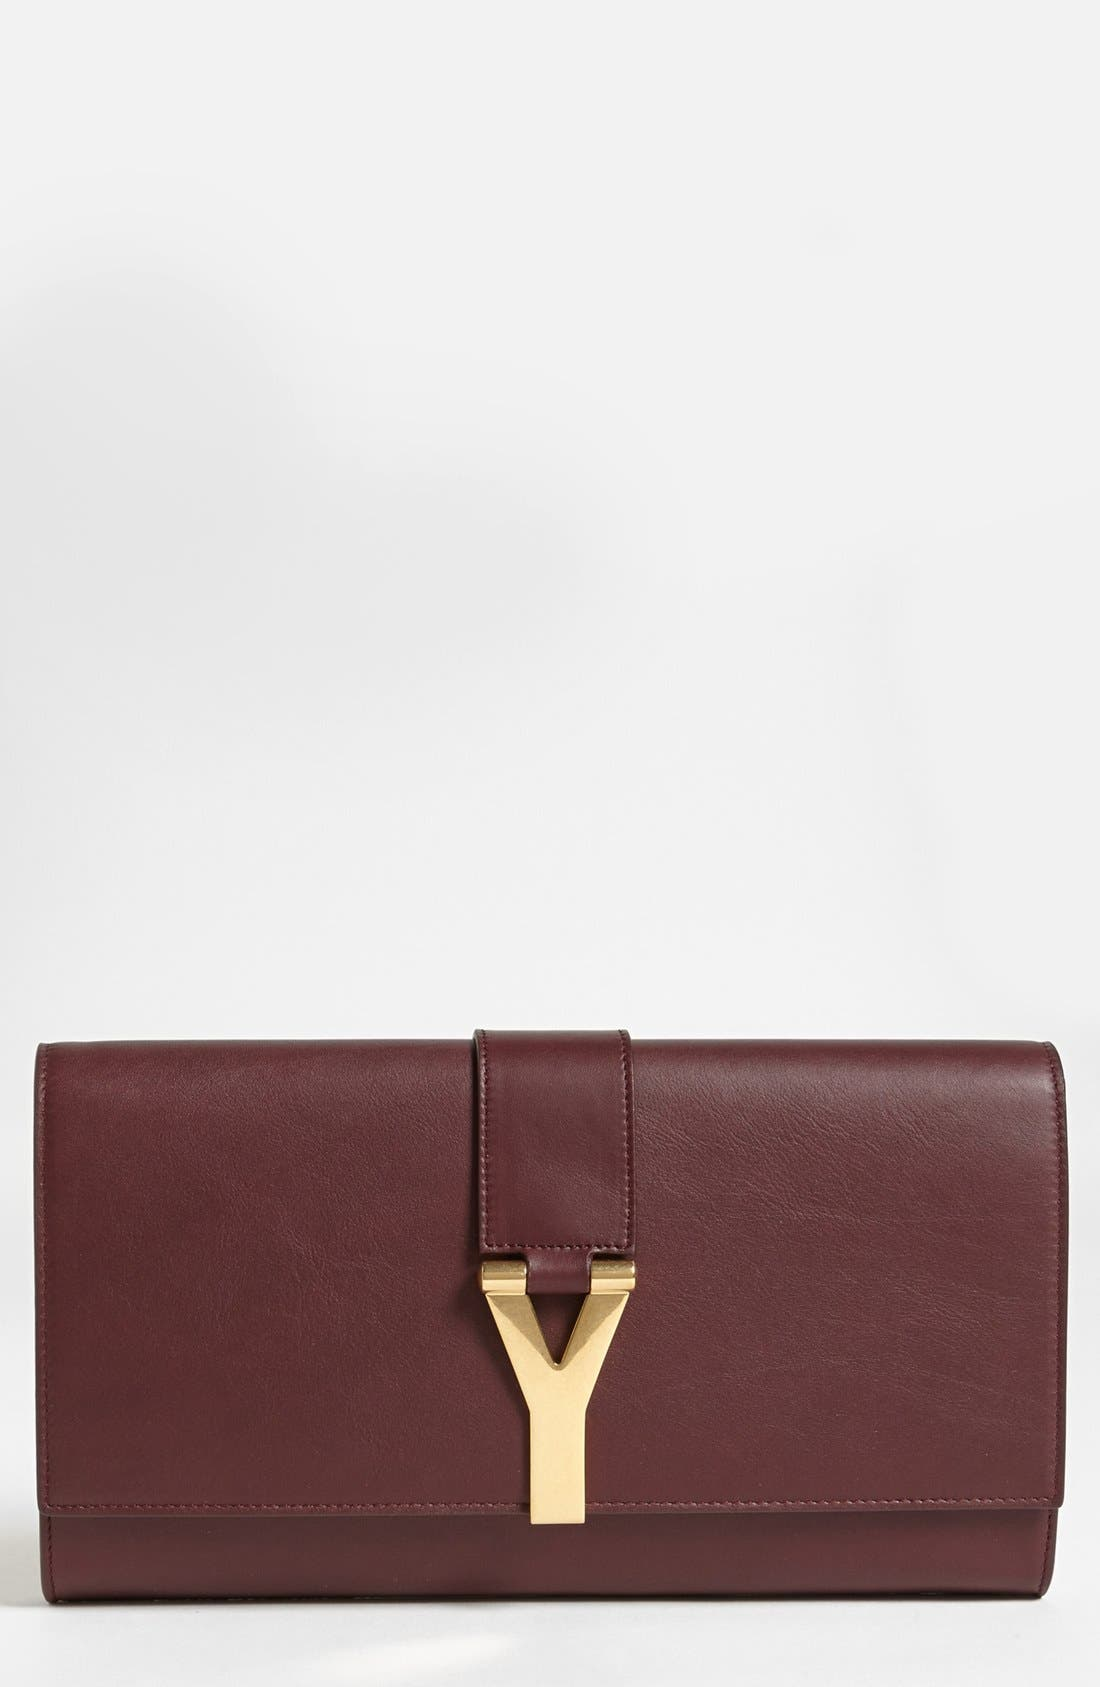 Alternate Image 1 Selected - Saint Laurent 'Y' Leather Clutch